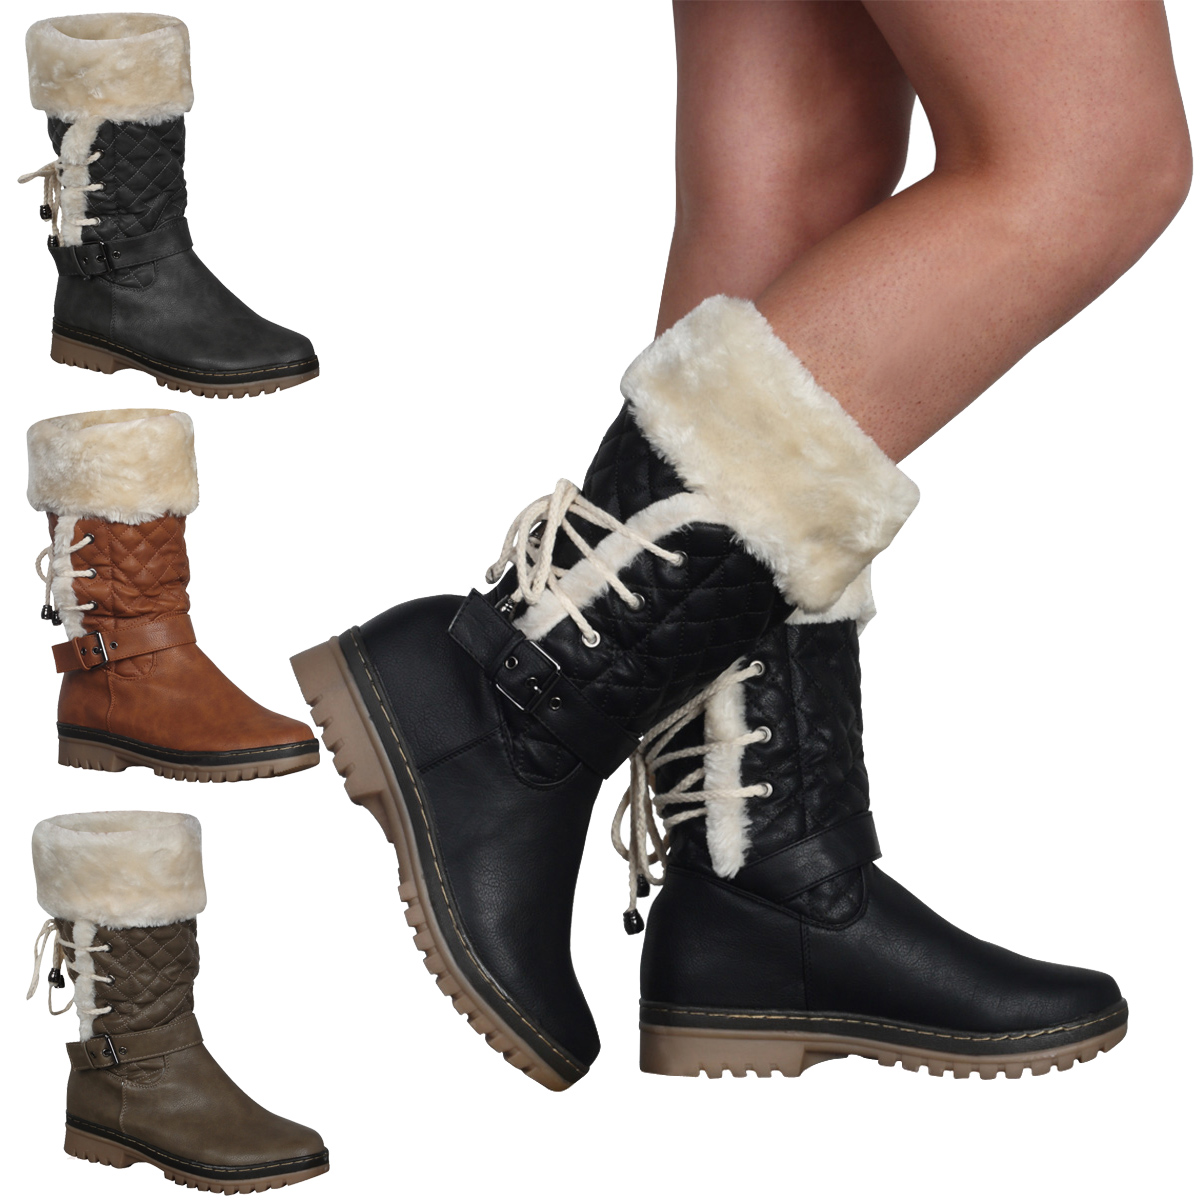 New Ladies Faux Fur Trim Womens Grip Sole Warm Winter Calf